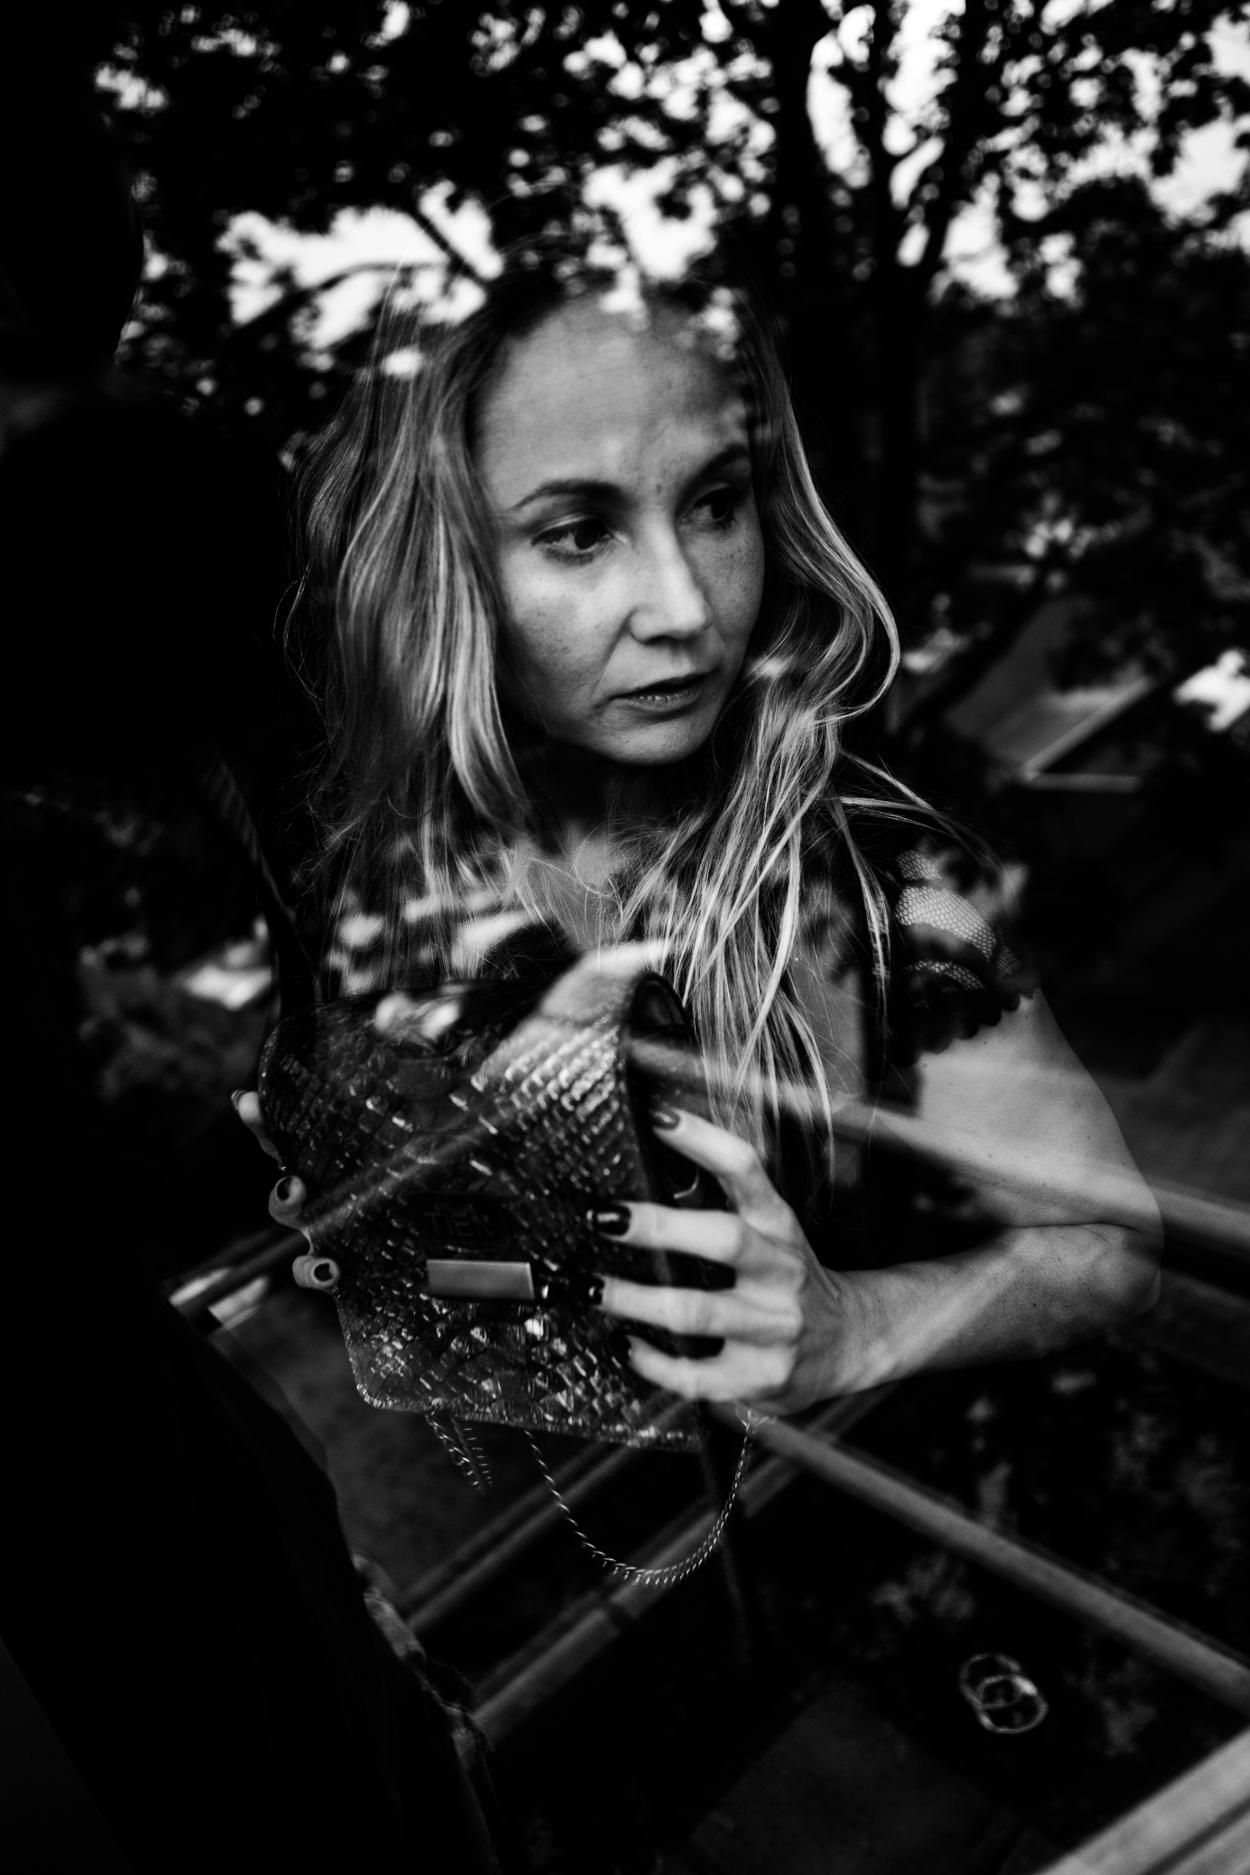 so-cee-lifestyle-blog-dutch-fashion-bag-10bags-tien-model-fitnessmodel-portrait-coach-balans-gezond-glutenvrij-mode-outfit-styling-kwetsbaar-storytelling-6